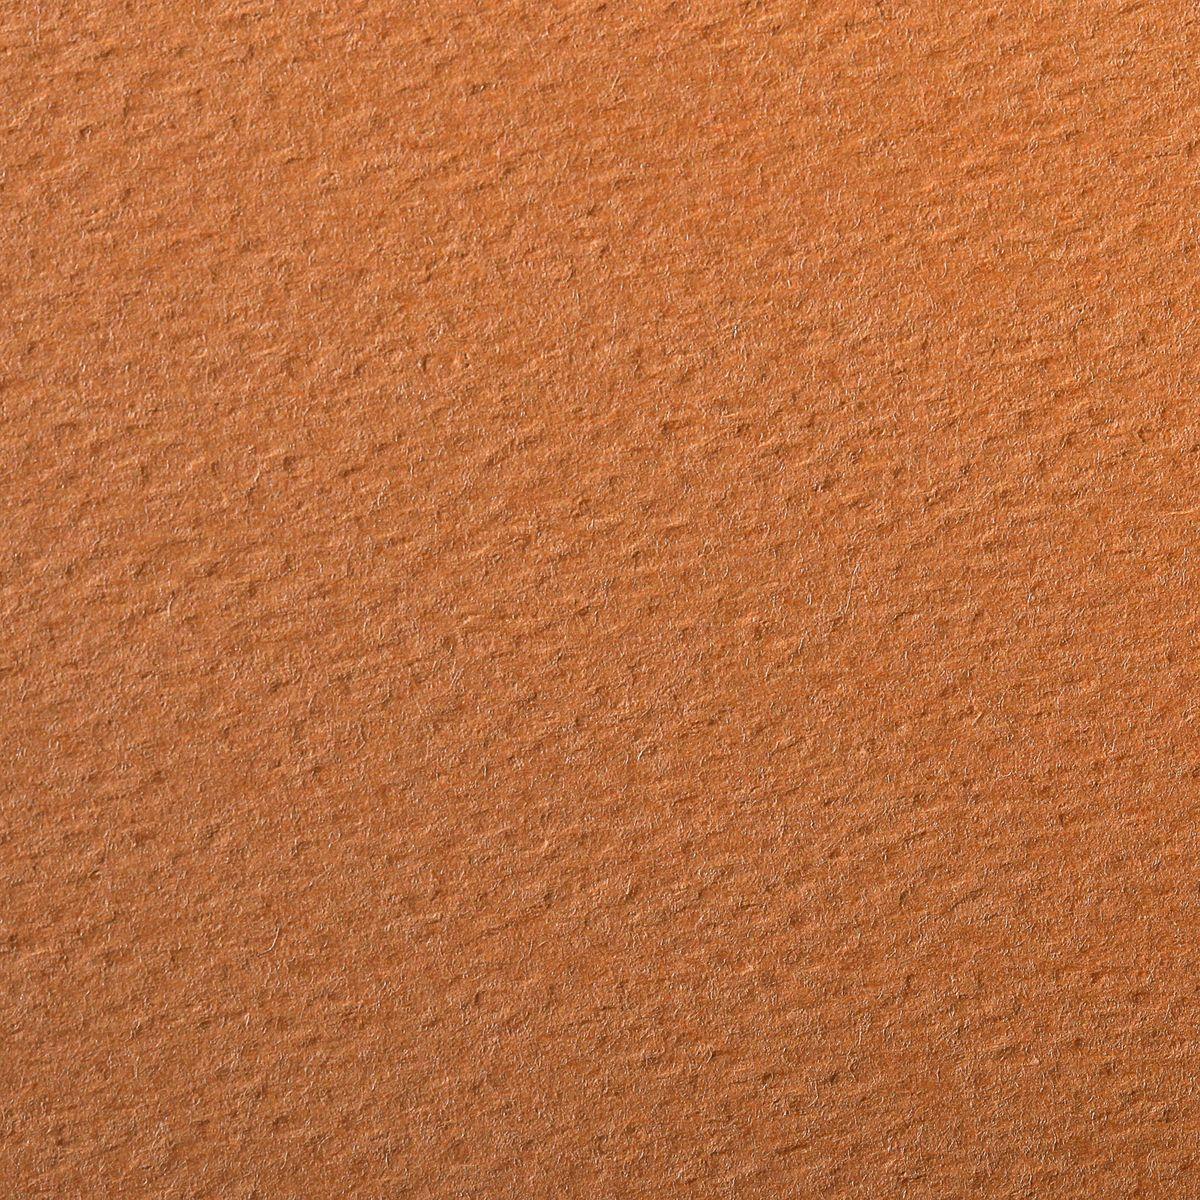 Бумага Clairefontaine Etival Color, формат A4, цвет обложки: темно-оранжевый, 25 листовSS 4041Бумага ETIVAL COLOR (А4, 160г, 25л) Ржавчина 93889С